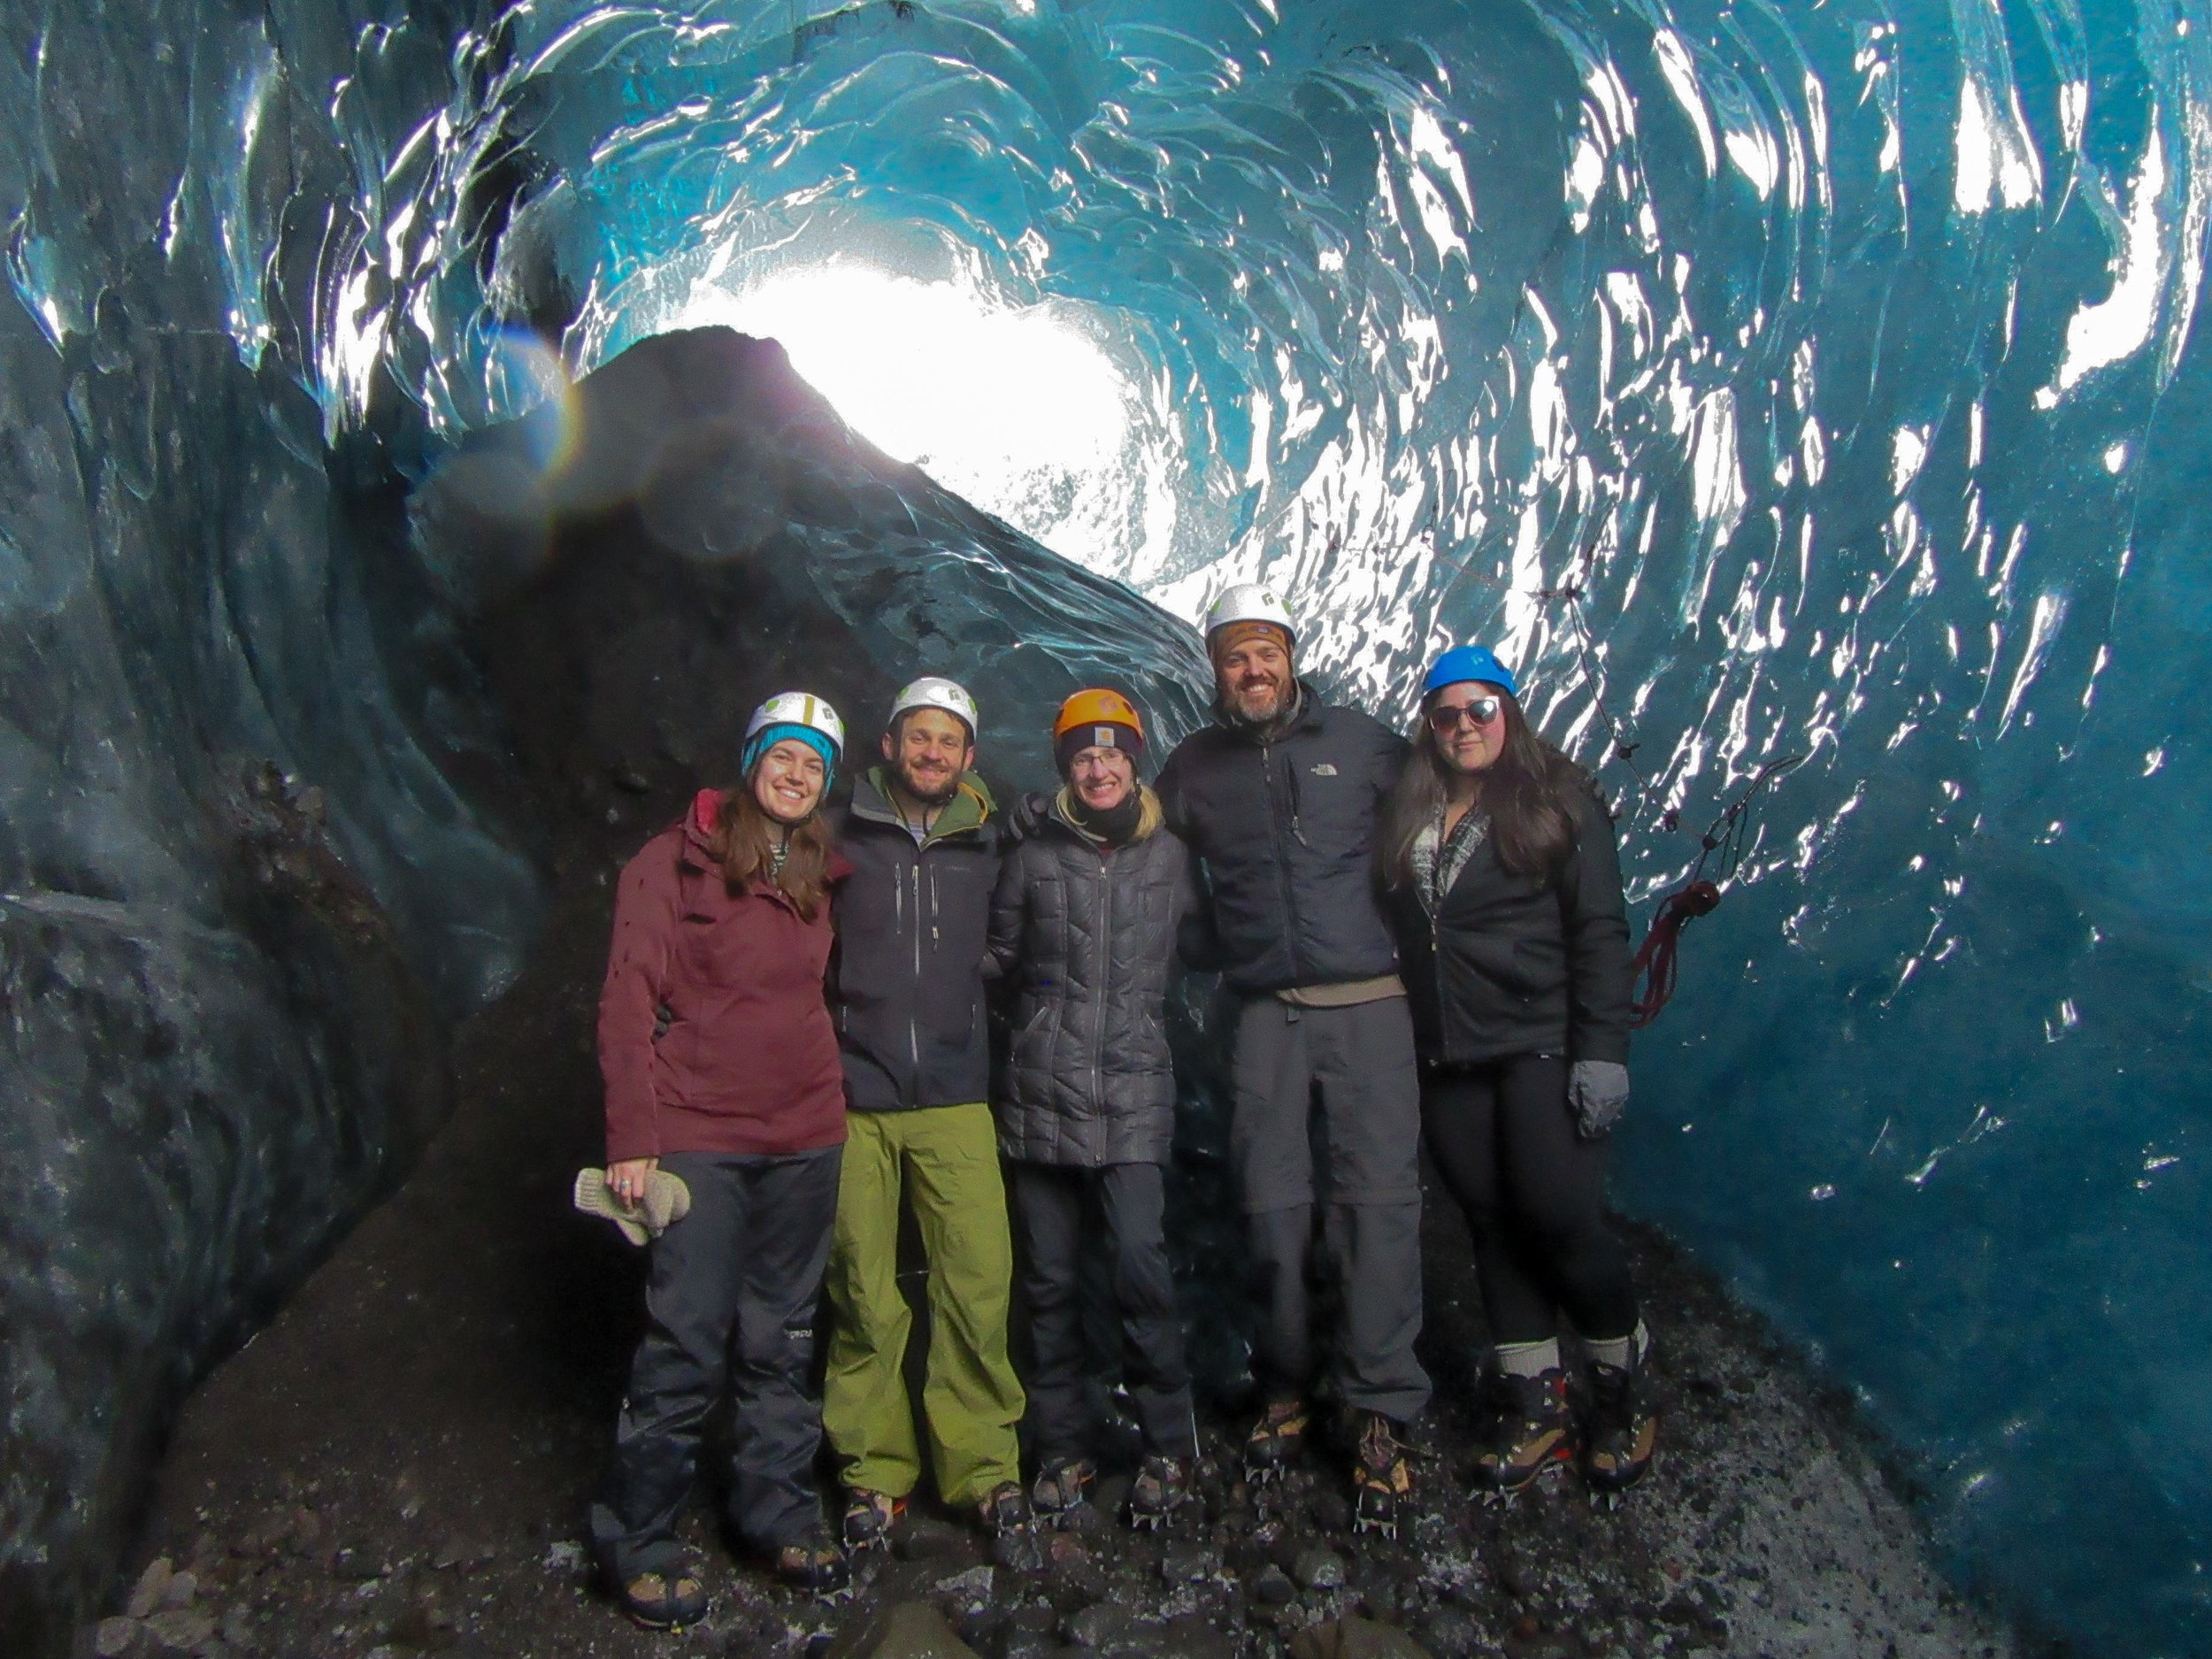 iceland-wr-187.jpg